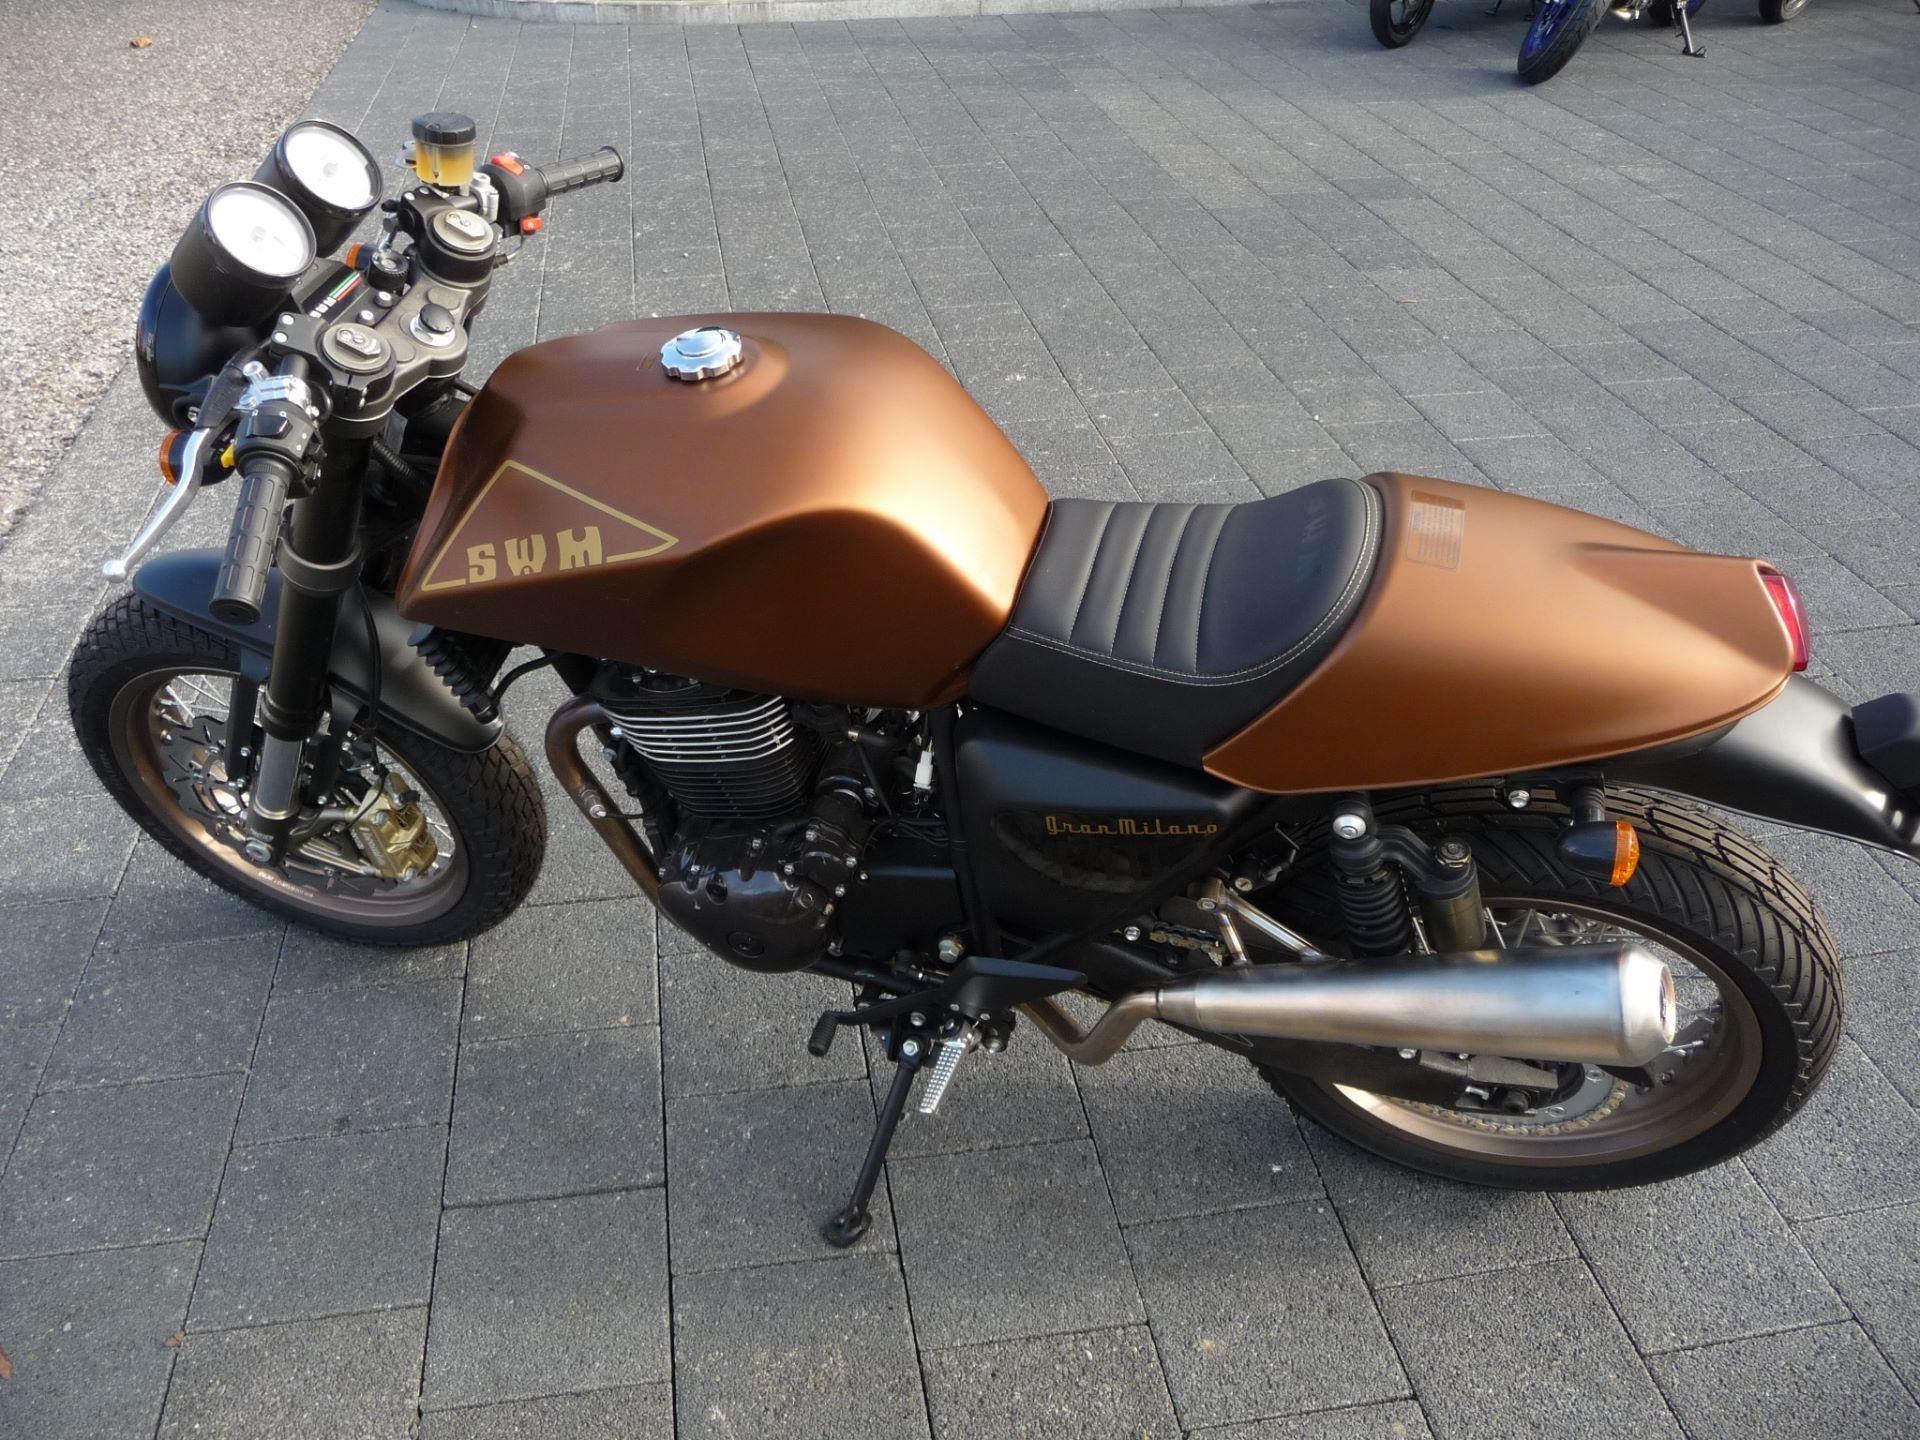 motorrad neufahrzeug kaufen swm gran milano 440 cafe racer moto kaufmann lyss lyss. Black Bedroom Furniture Sets. Home Design Ideas